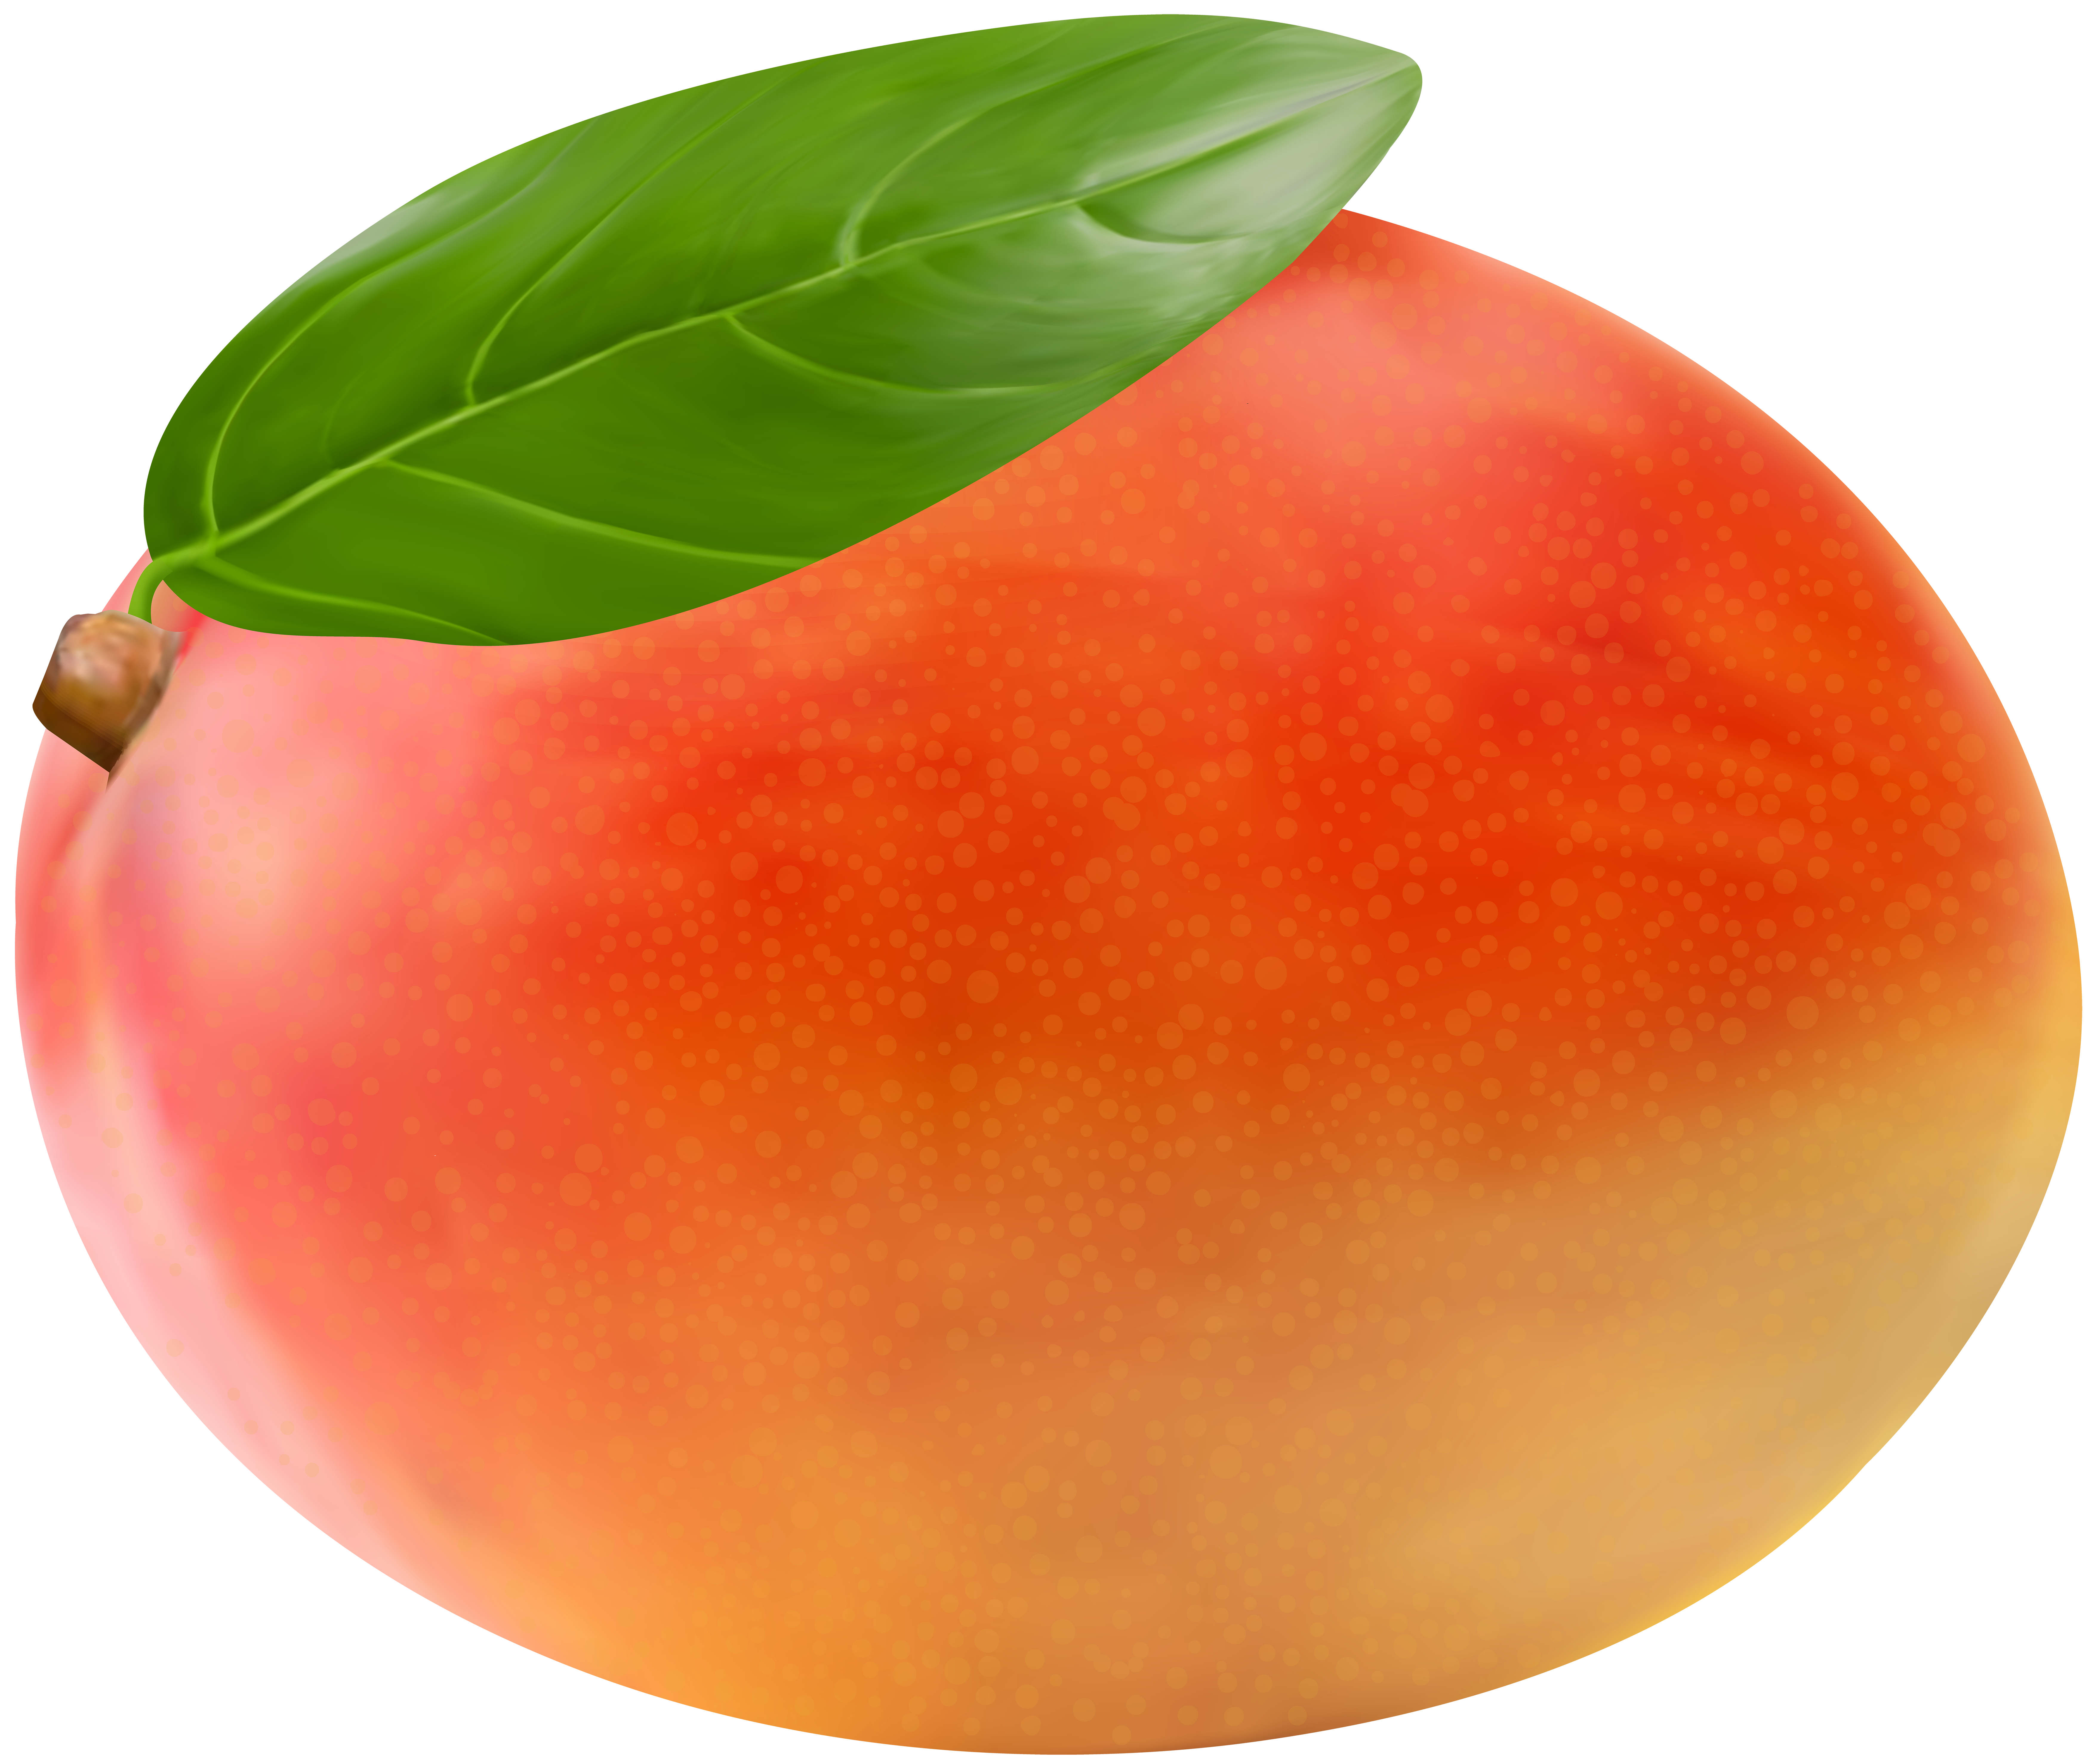 Fruit png clip art. Mango clipart red